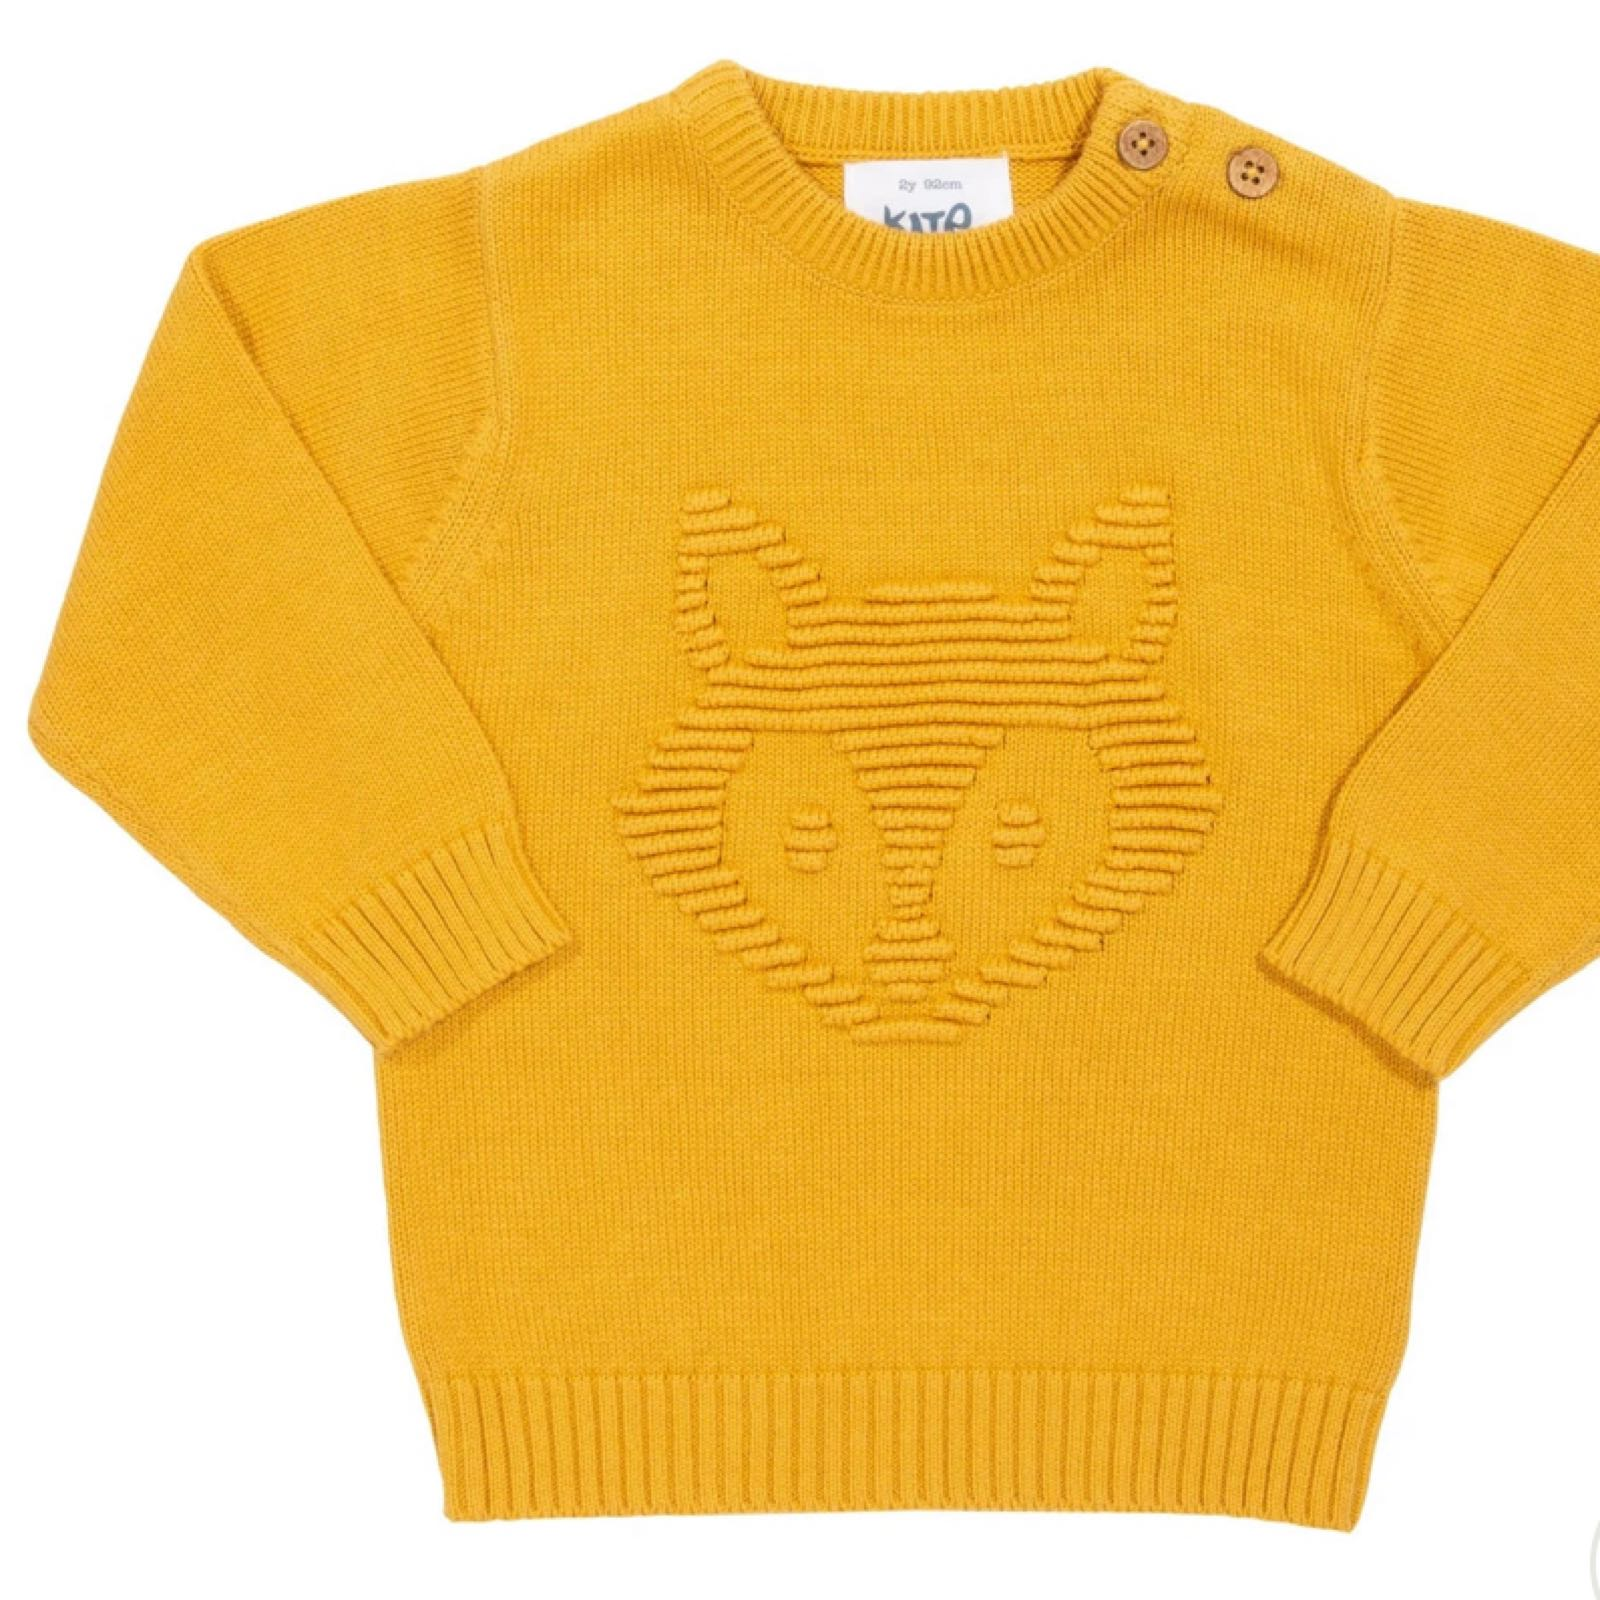 Little Cub jumper